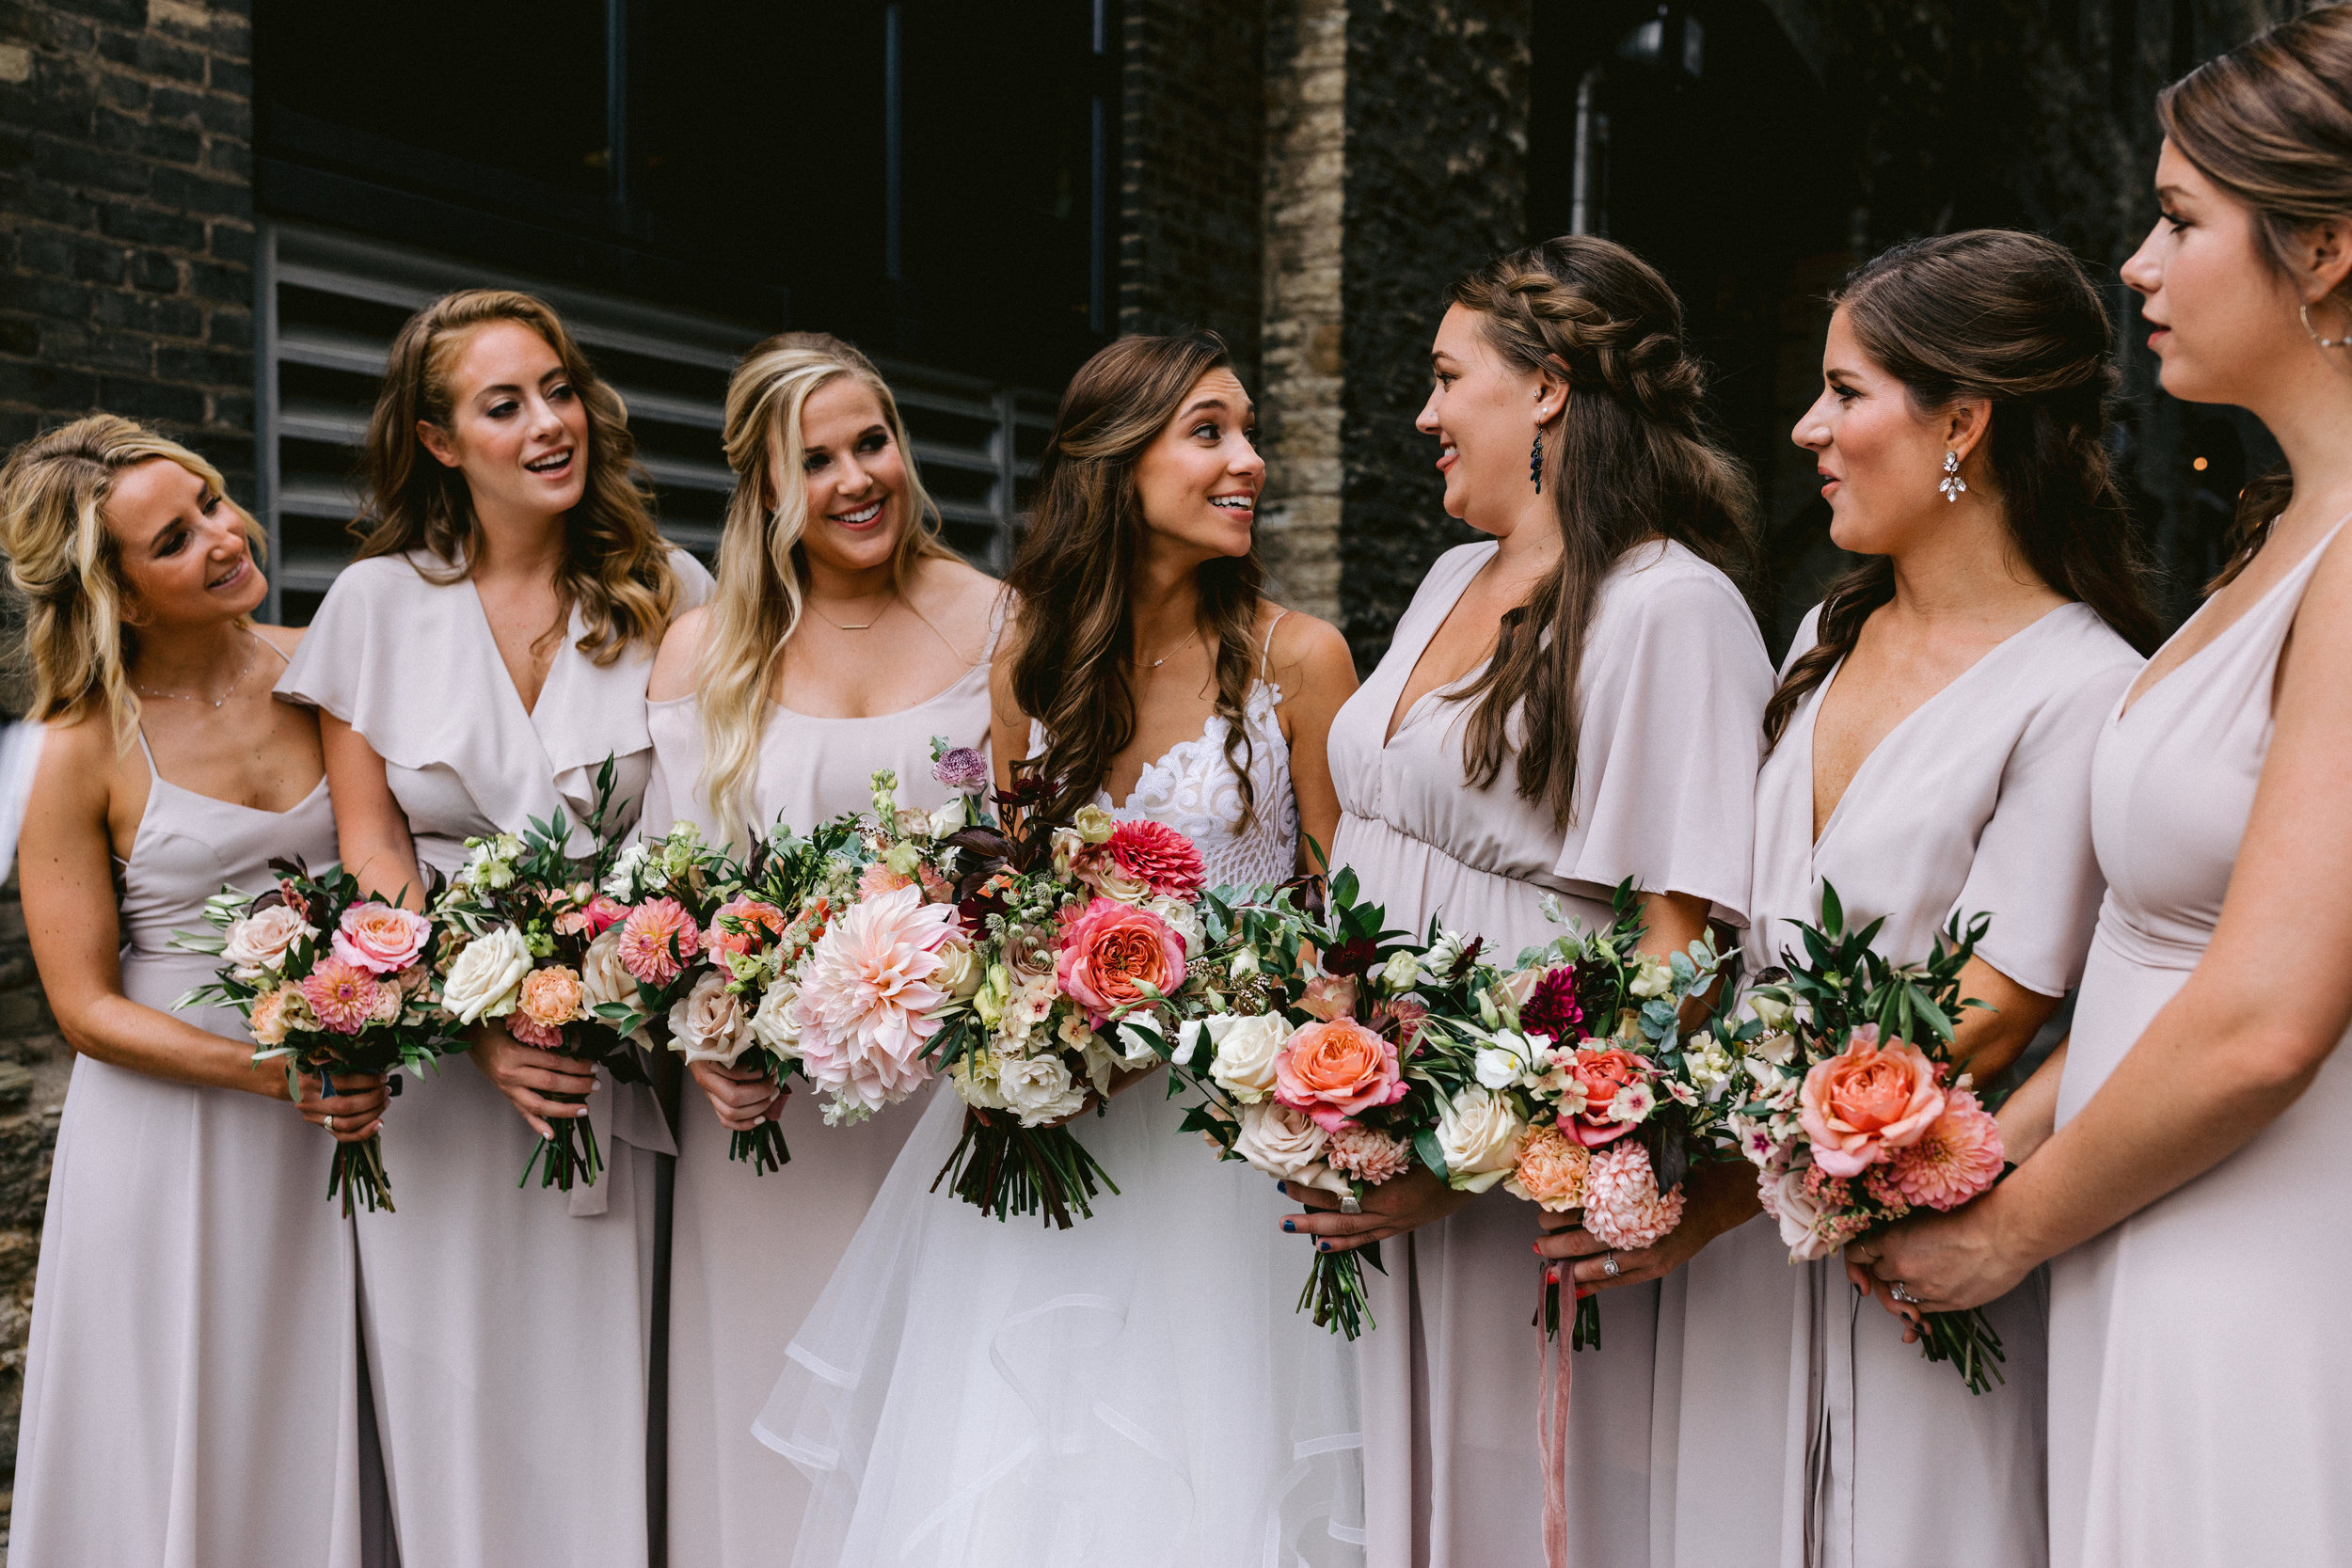 solarartsbychowgirlswedding-24.jpg